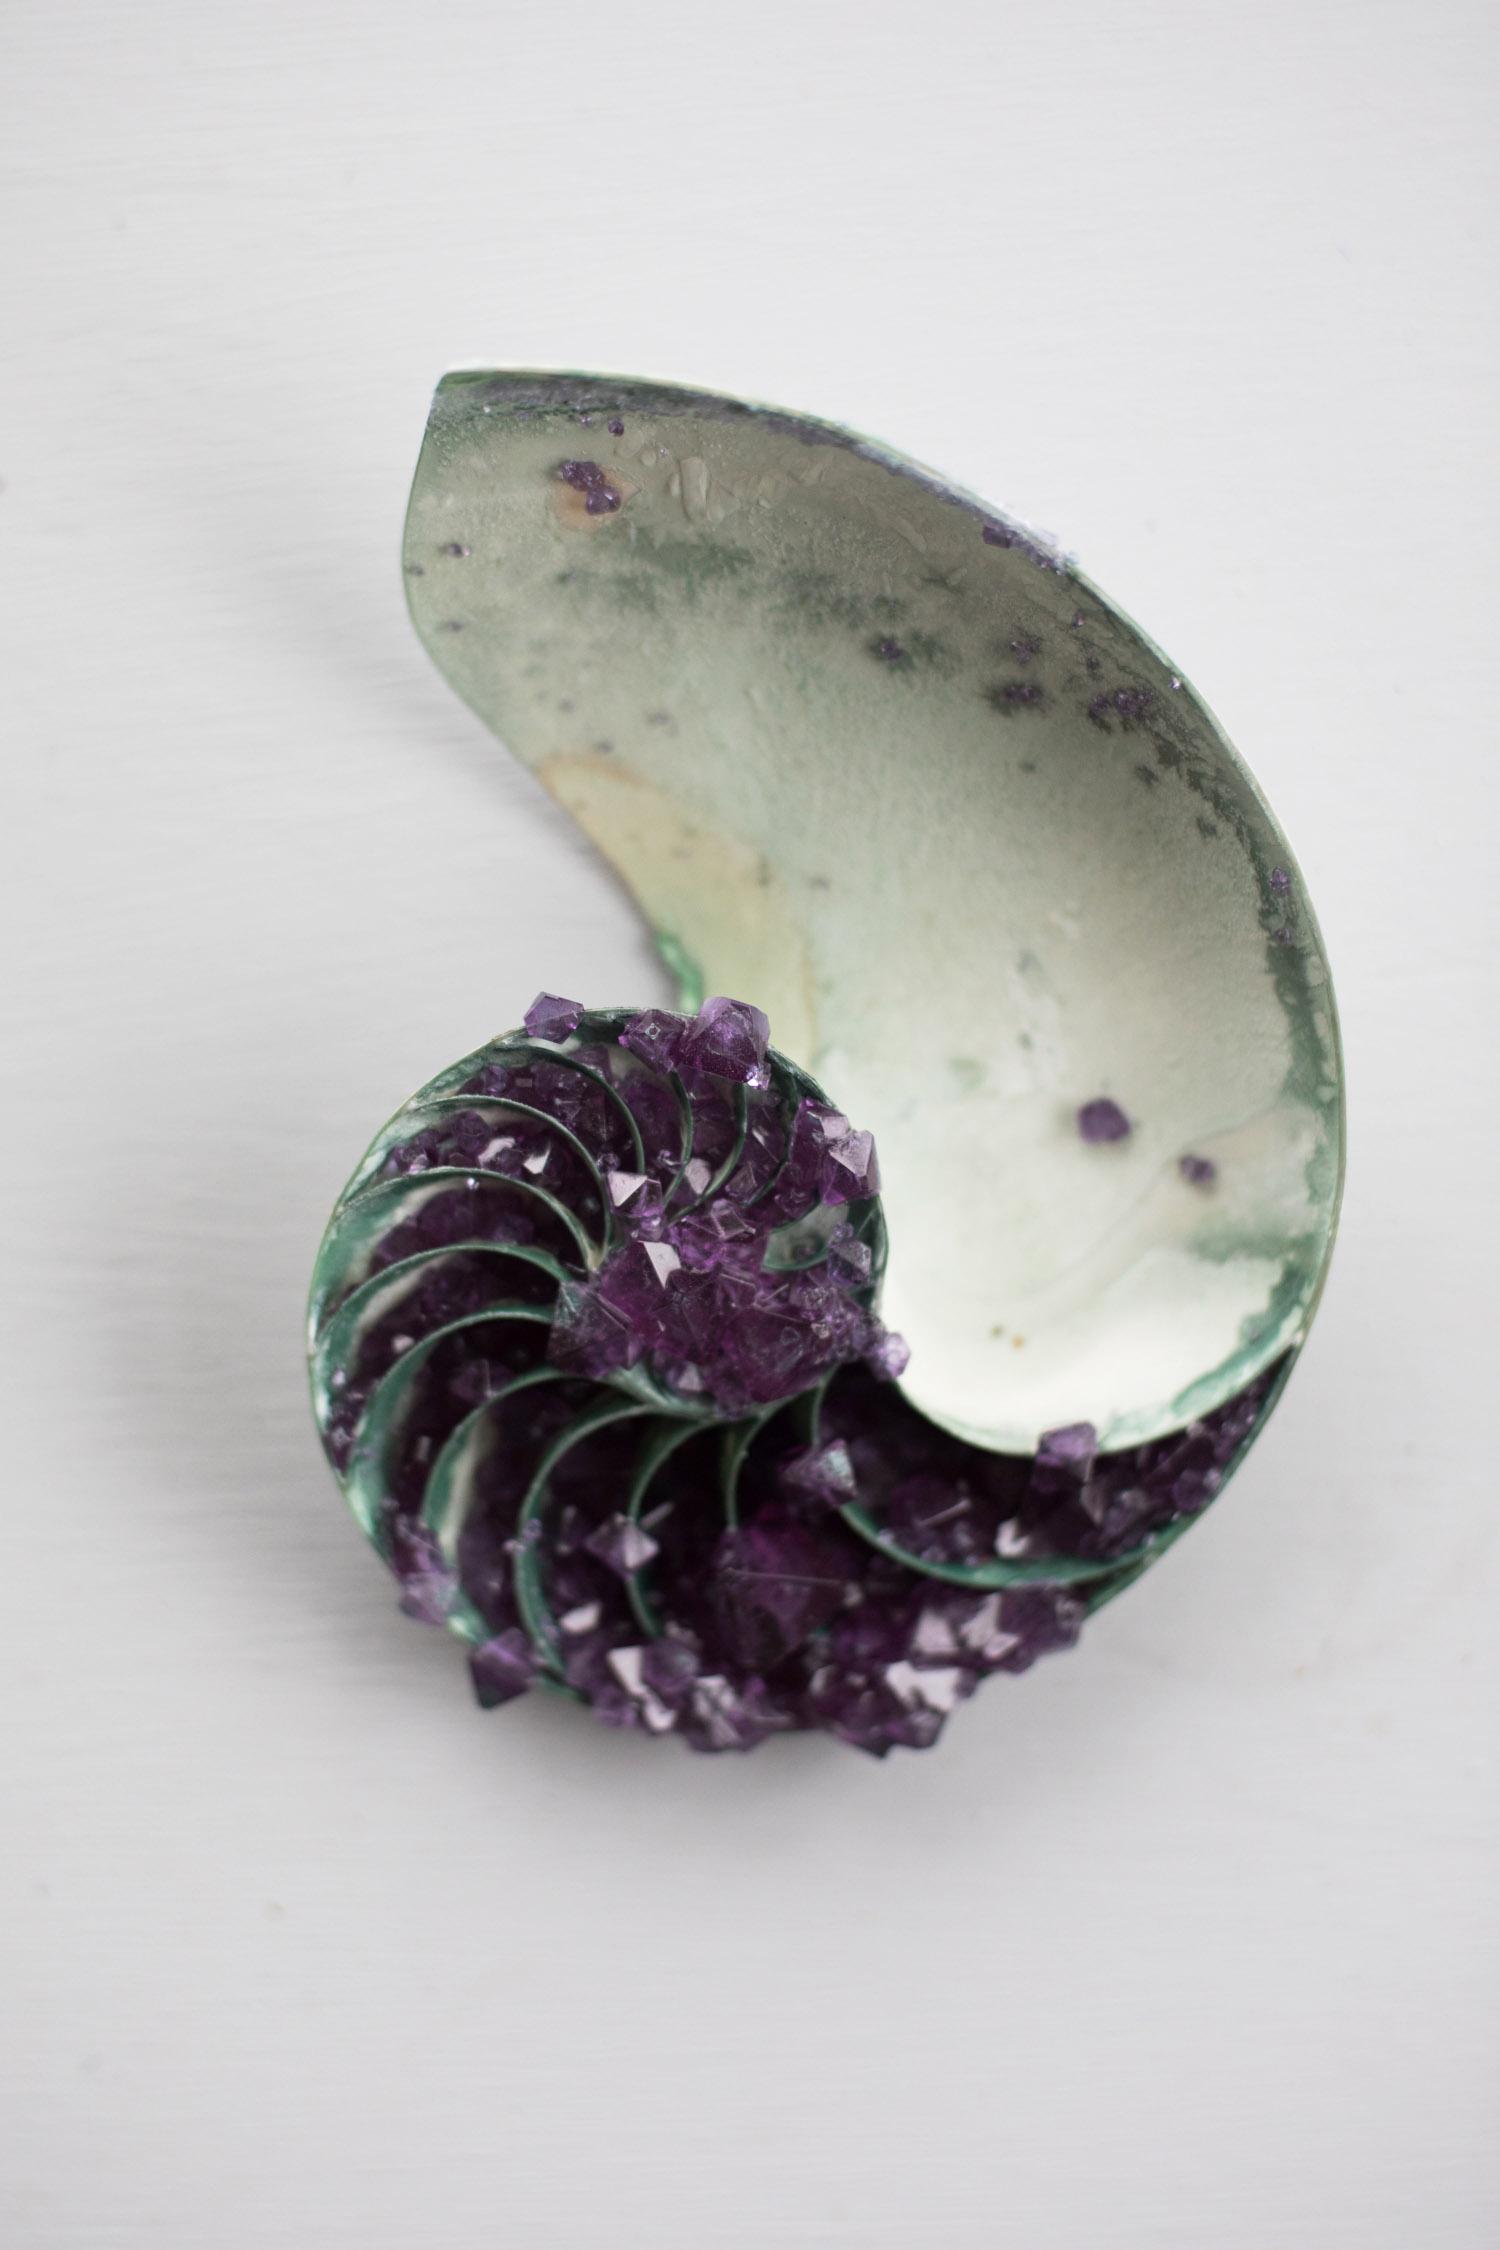 tyler-thrasher---amethyst-nautilus-shell_33390767423_o